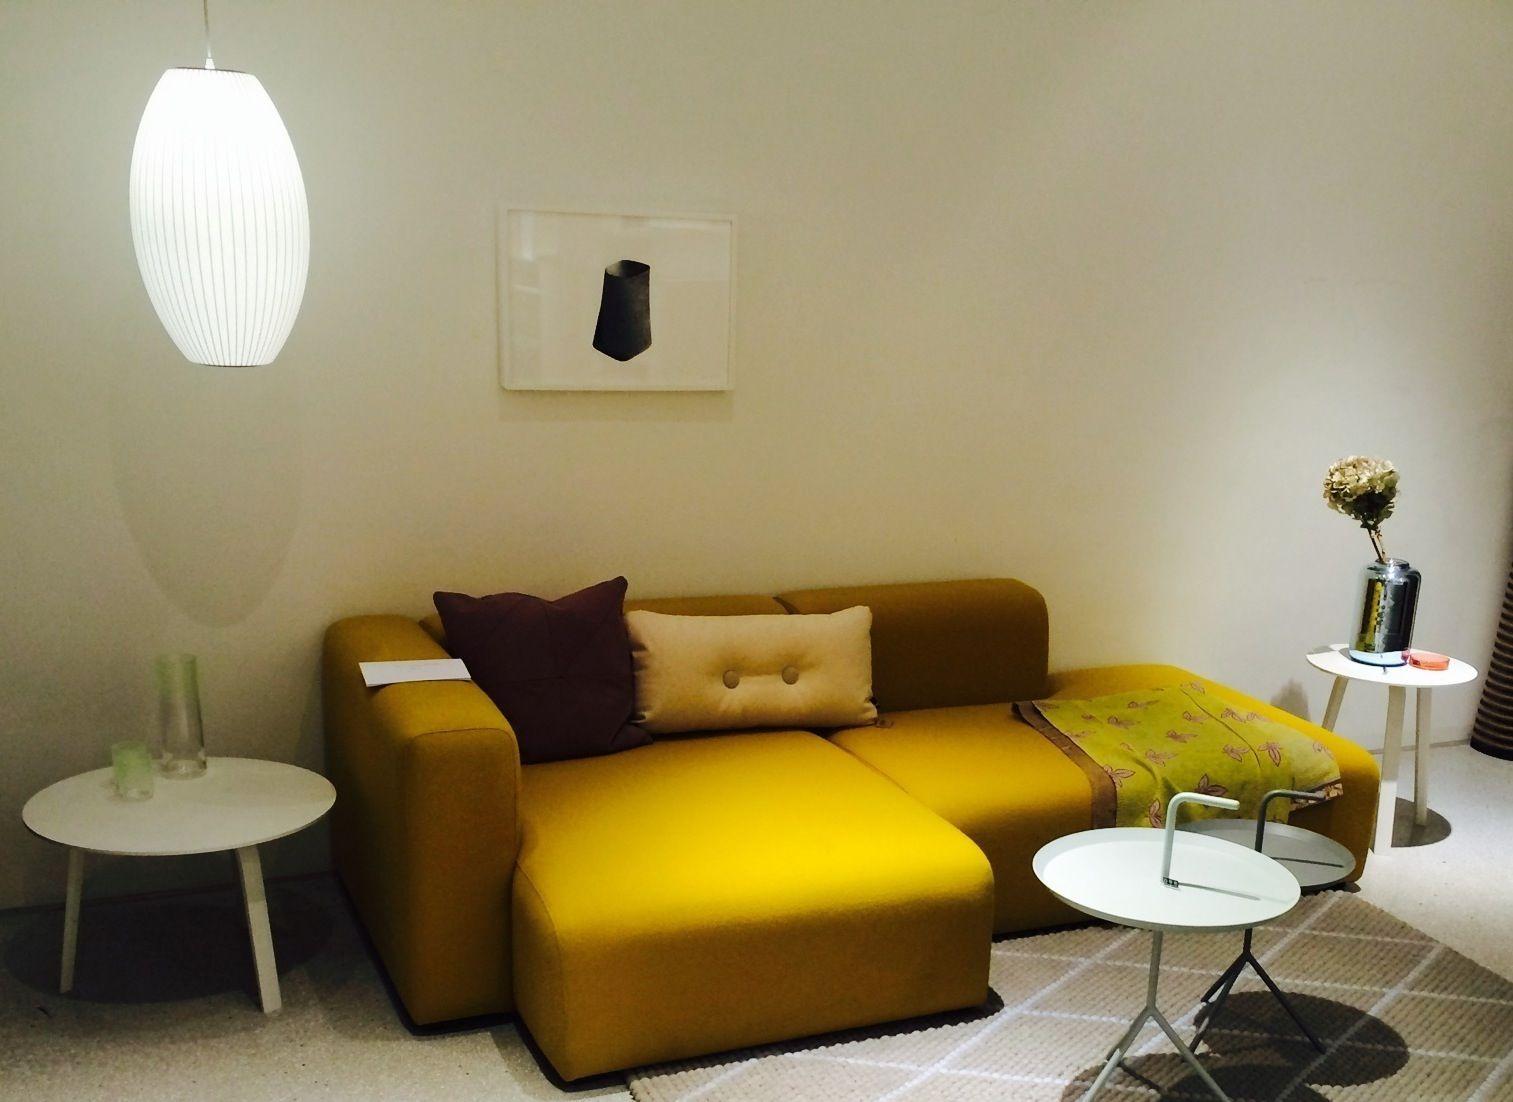 hay sofa kvadrat la z boy cover mag by http decdesignecasa blogspot it my